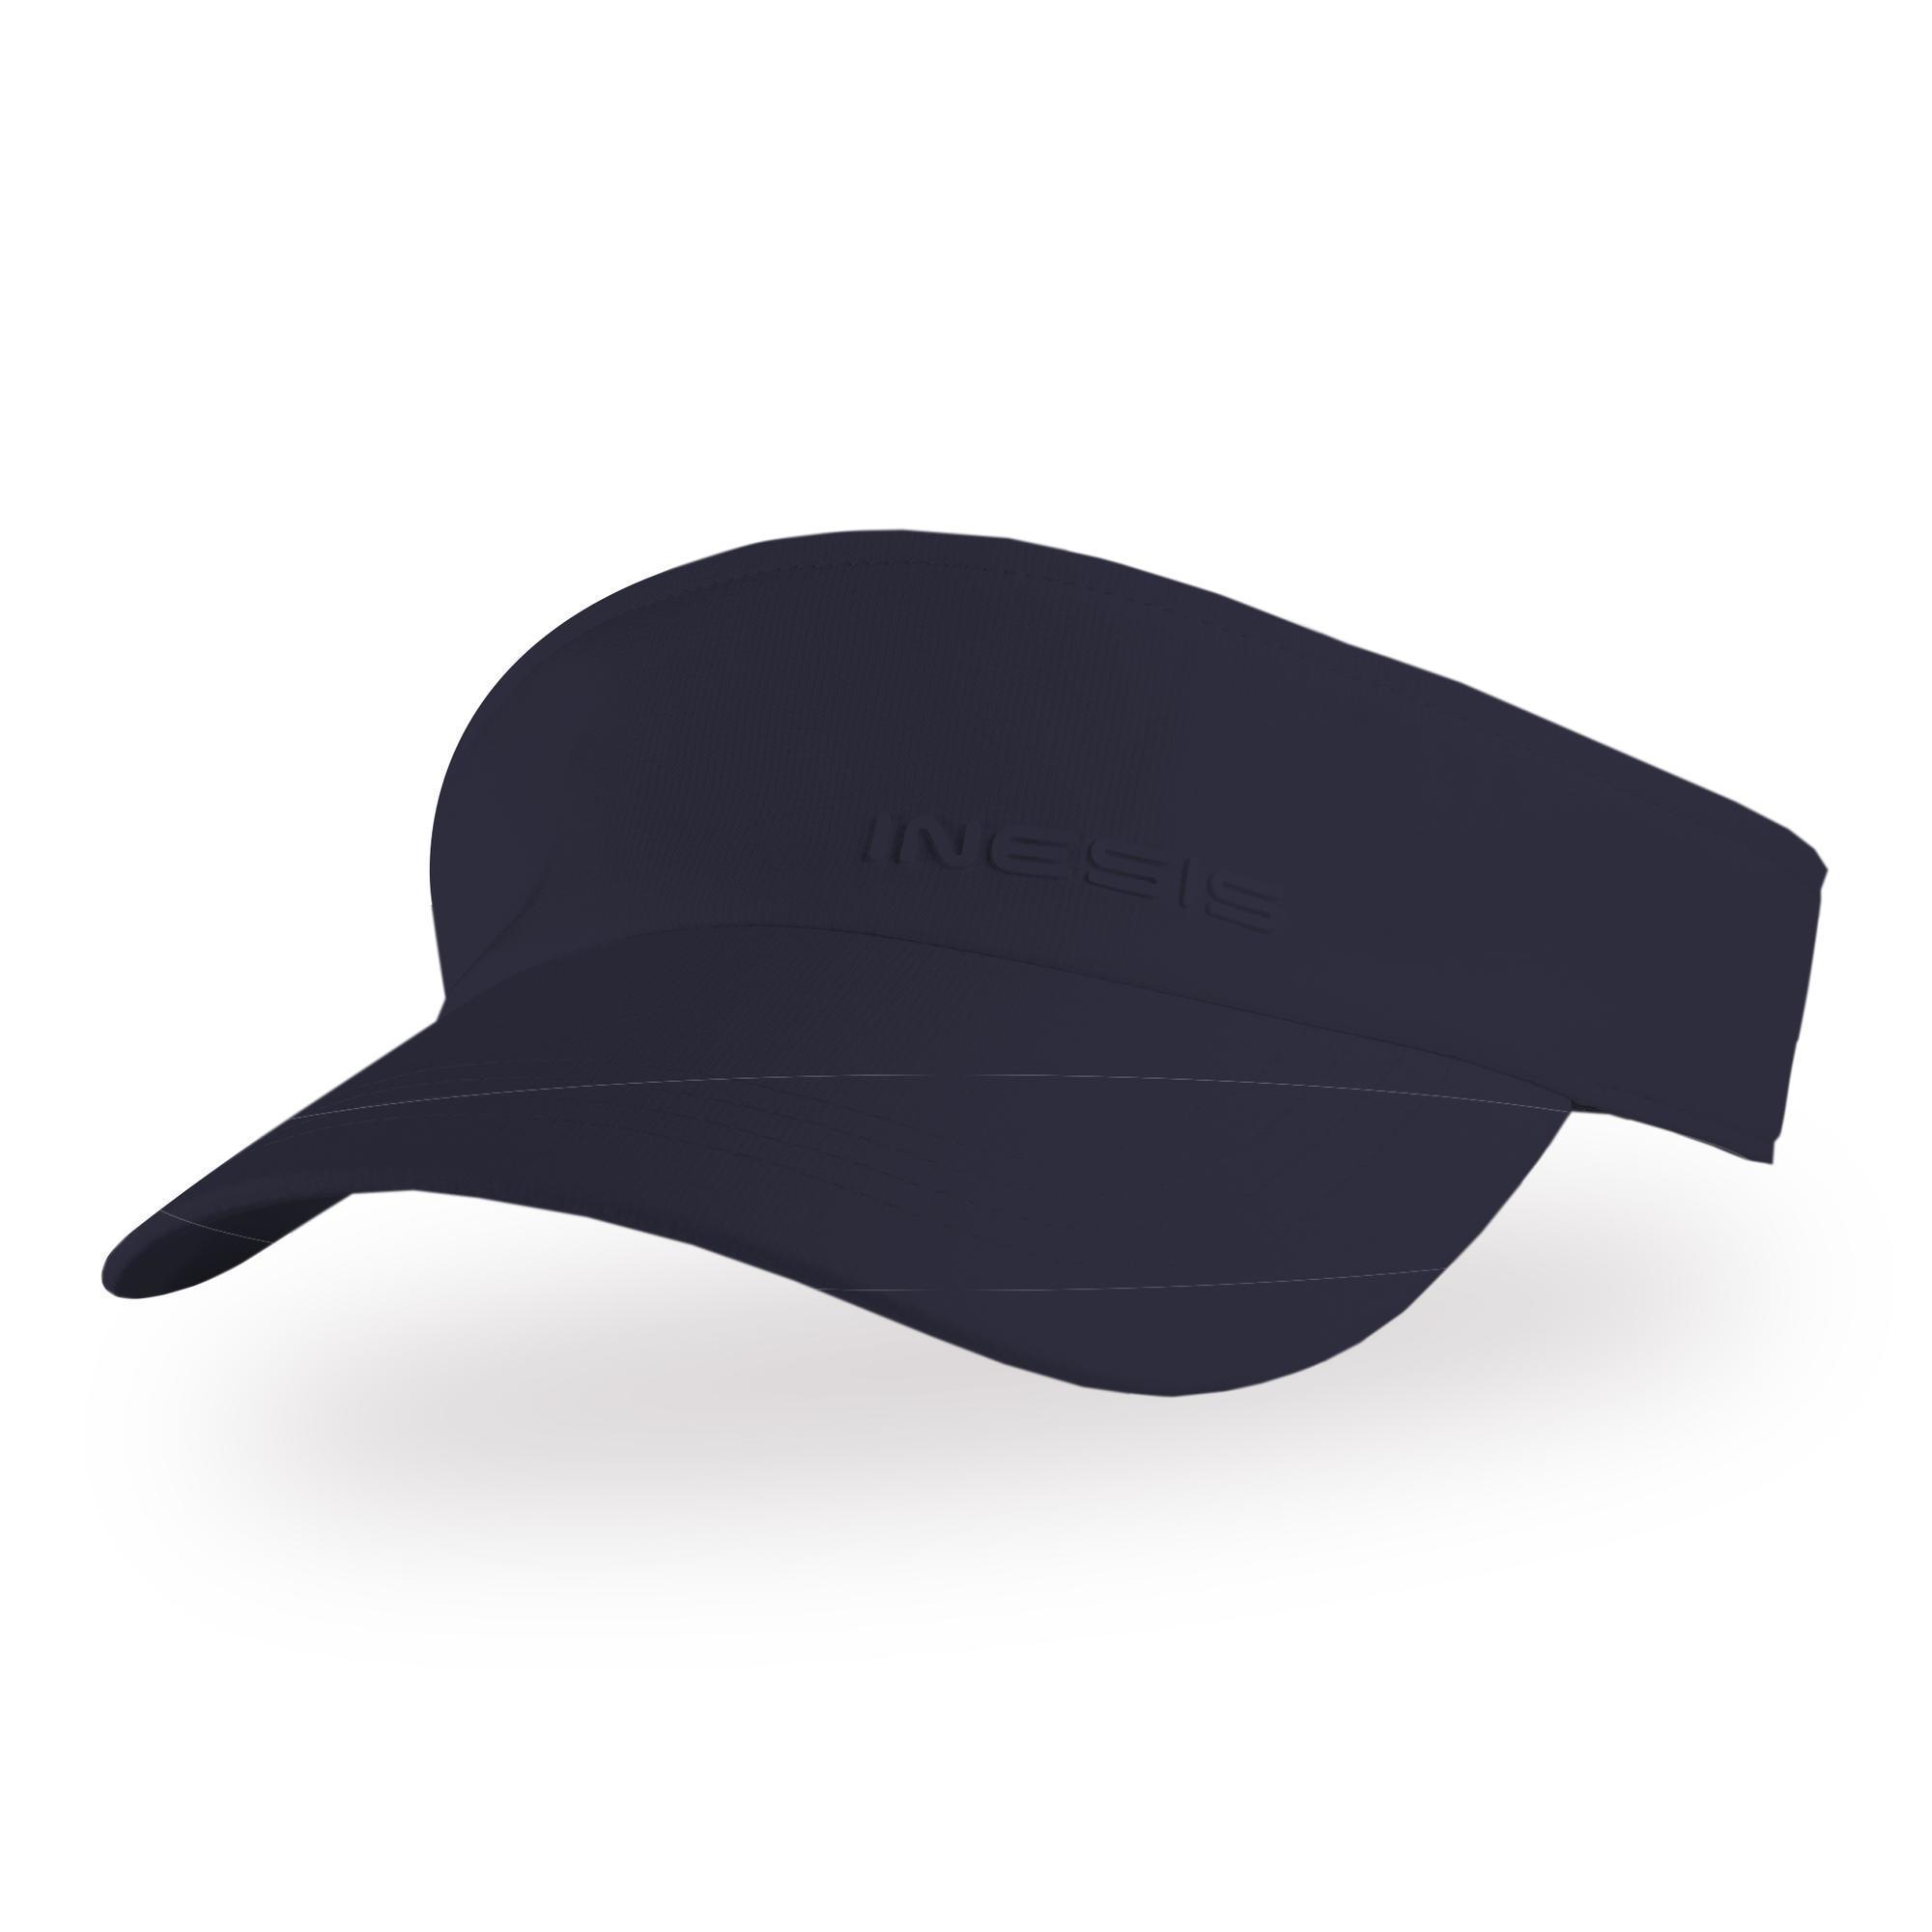 Golf Visor marineblau | Accessoires > Caps > Visors | Blau | Inesis